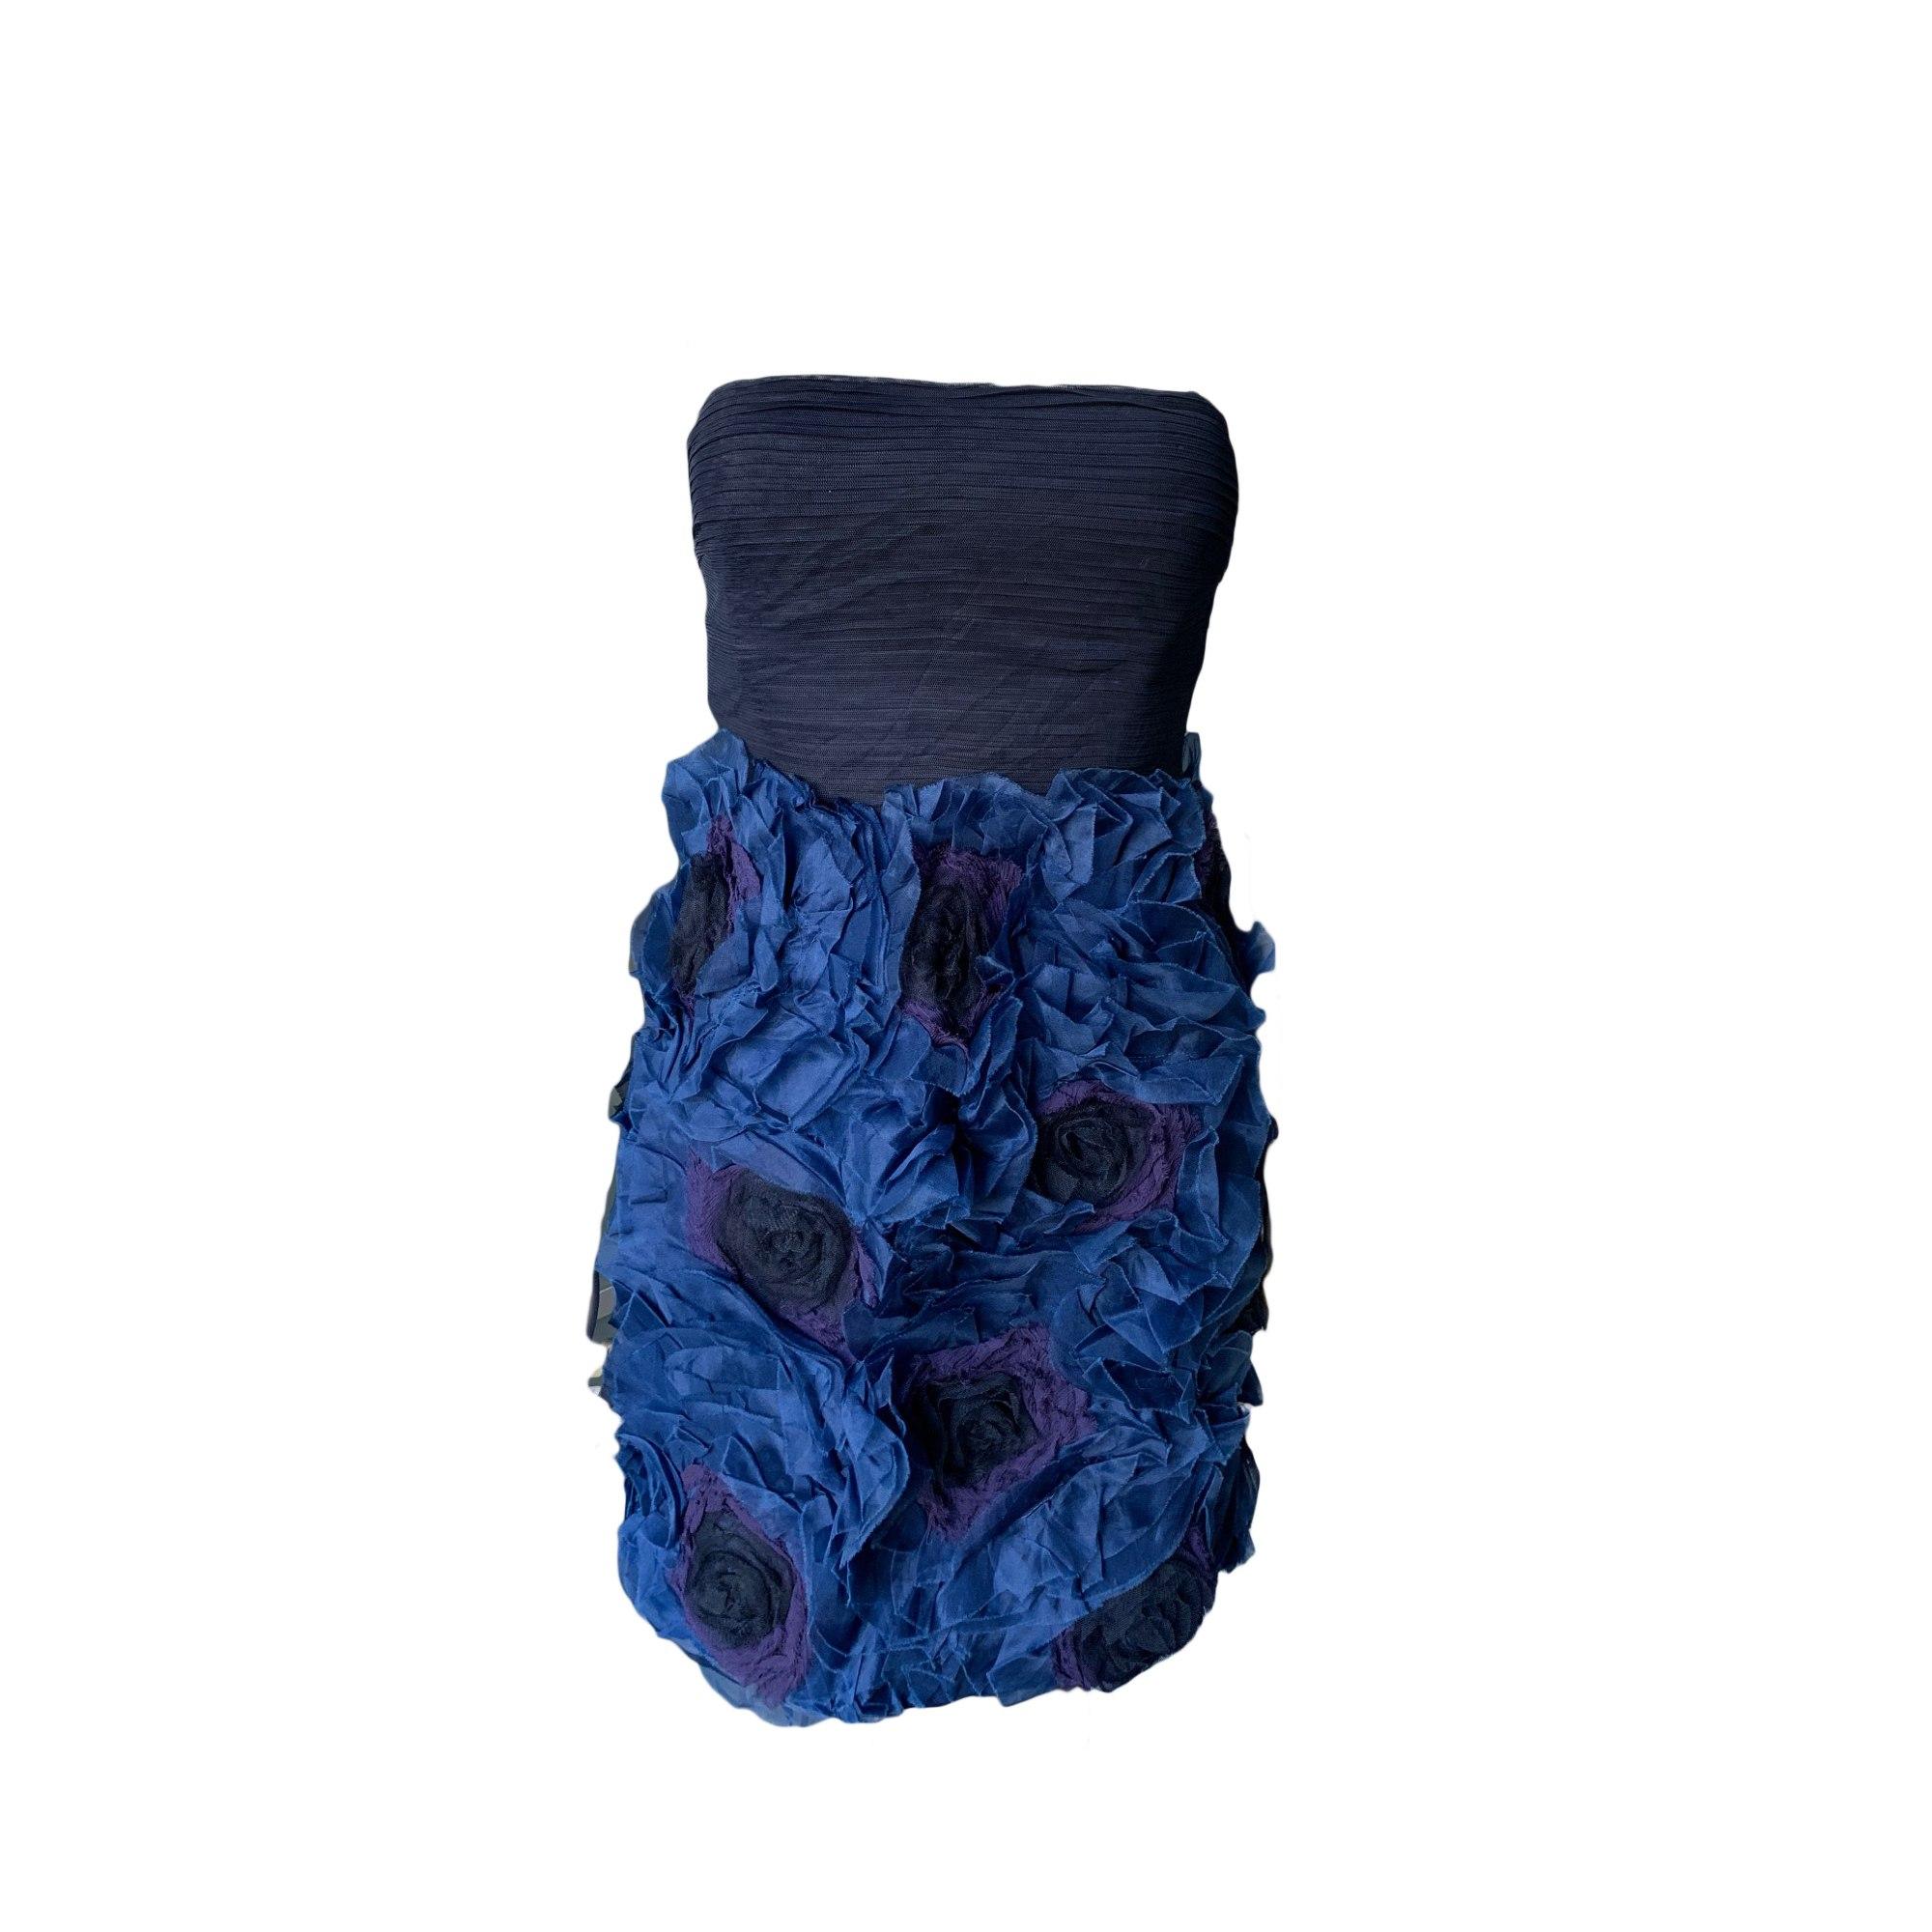 Robe bustier BCBG MAX AZRIA Bleu, bleu marine, bleu turquoise